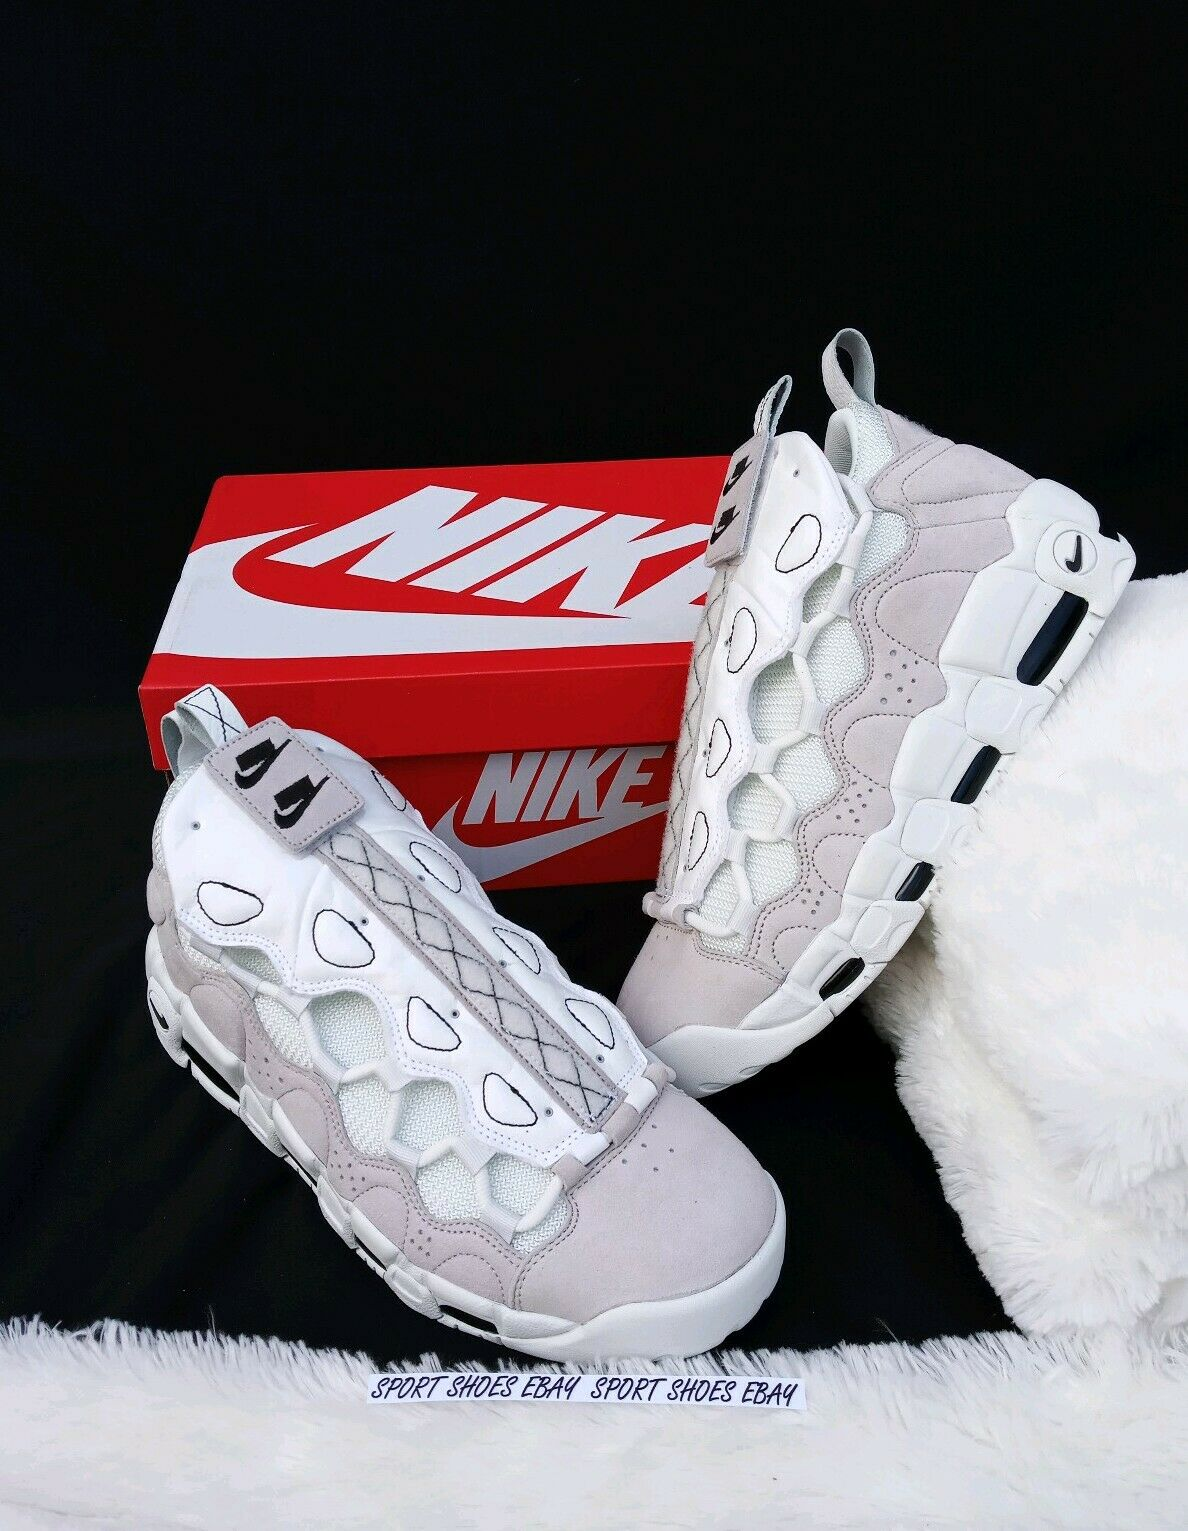 Air NIKE MEN'S 10 SIZE Money More 001 White AQ0112 Grey Vast